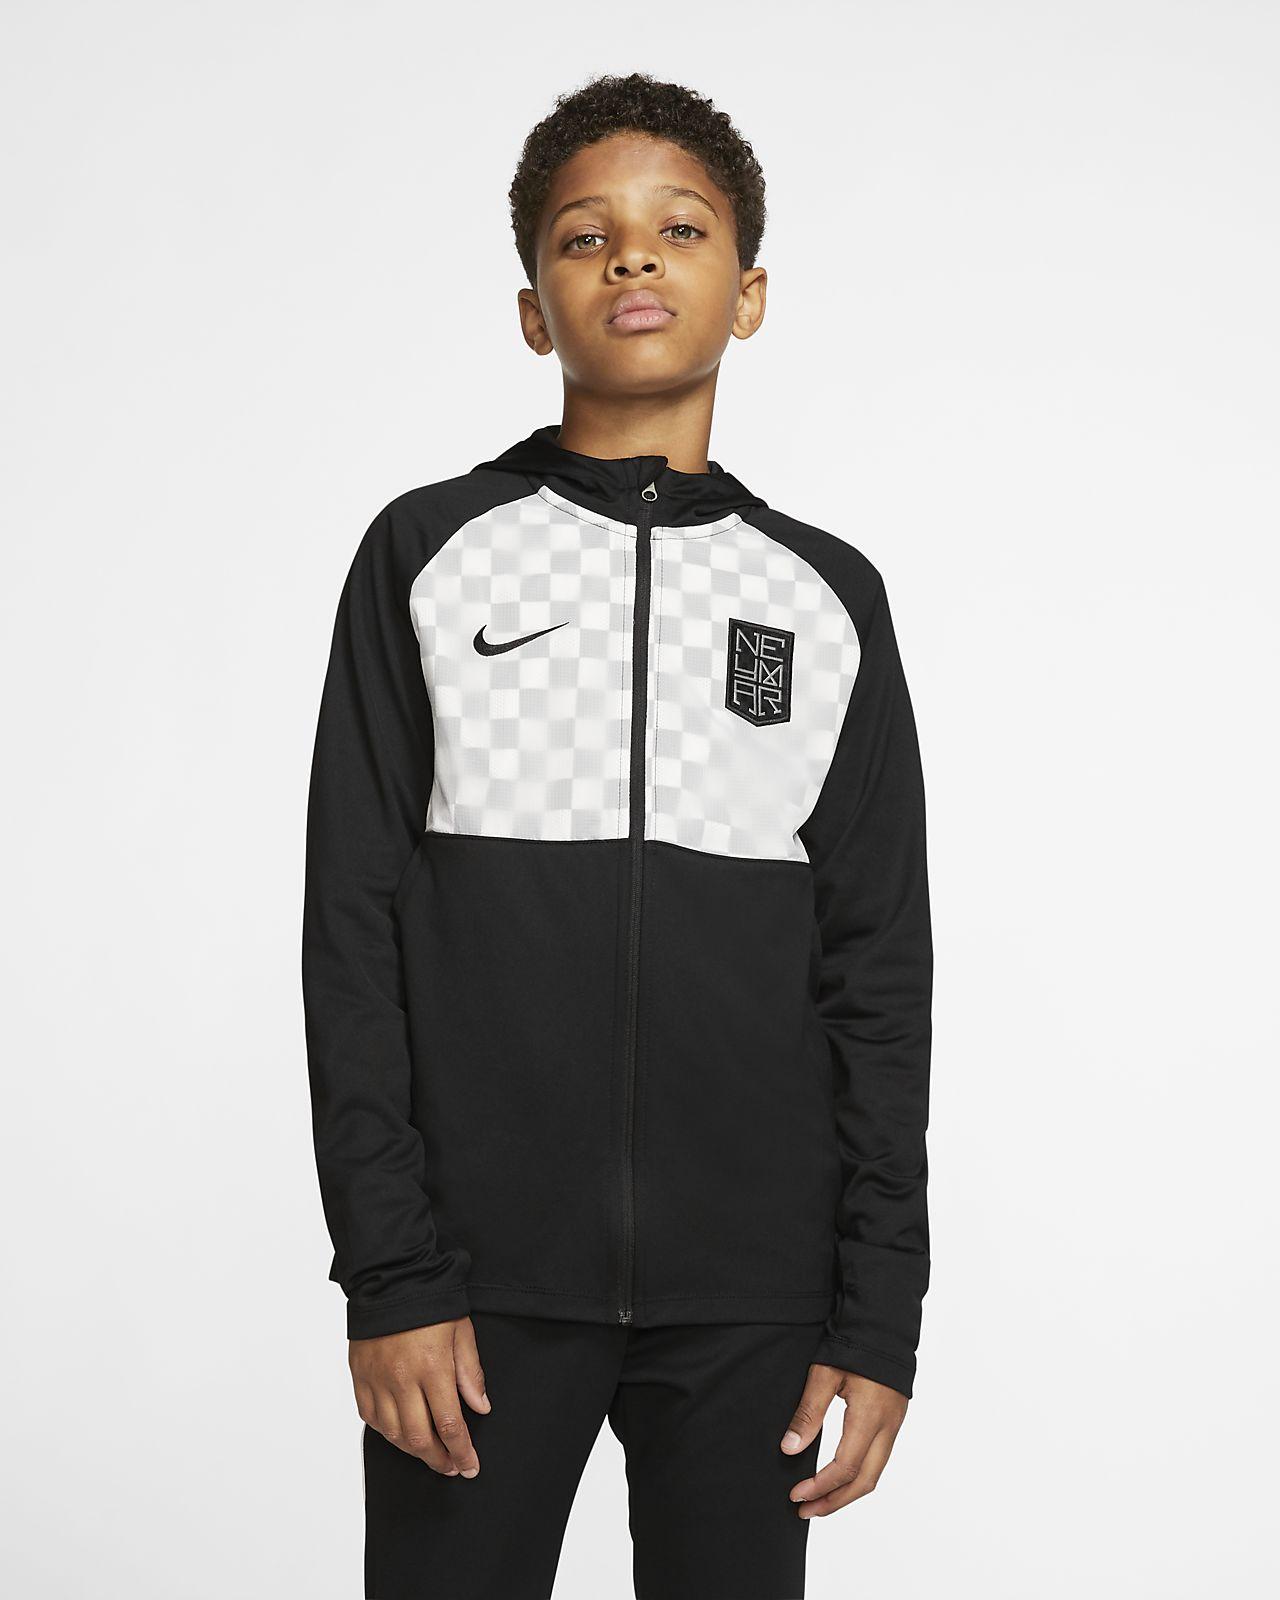 Nike Dri FIT Neymar Jr. Fußballjacke für ältere Kinder